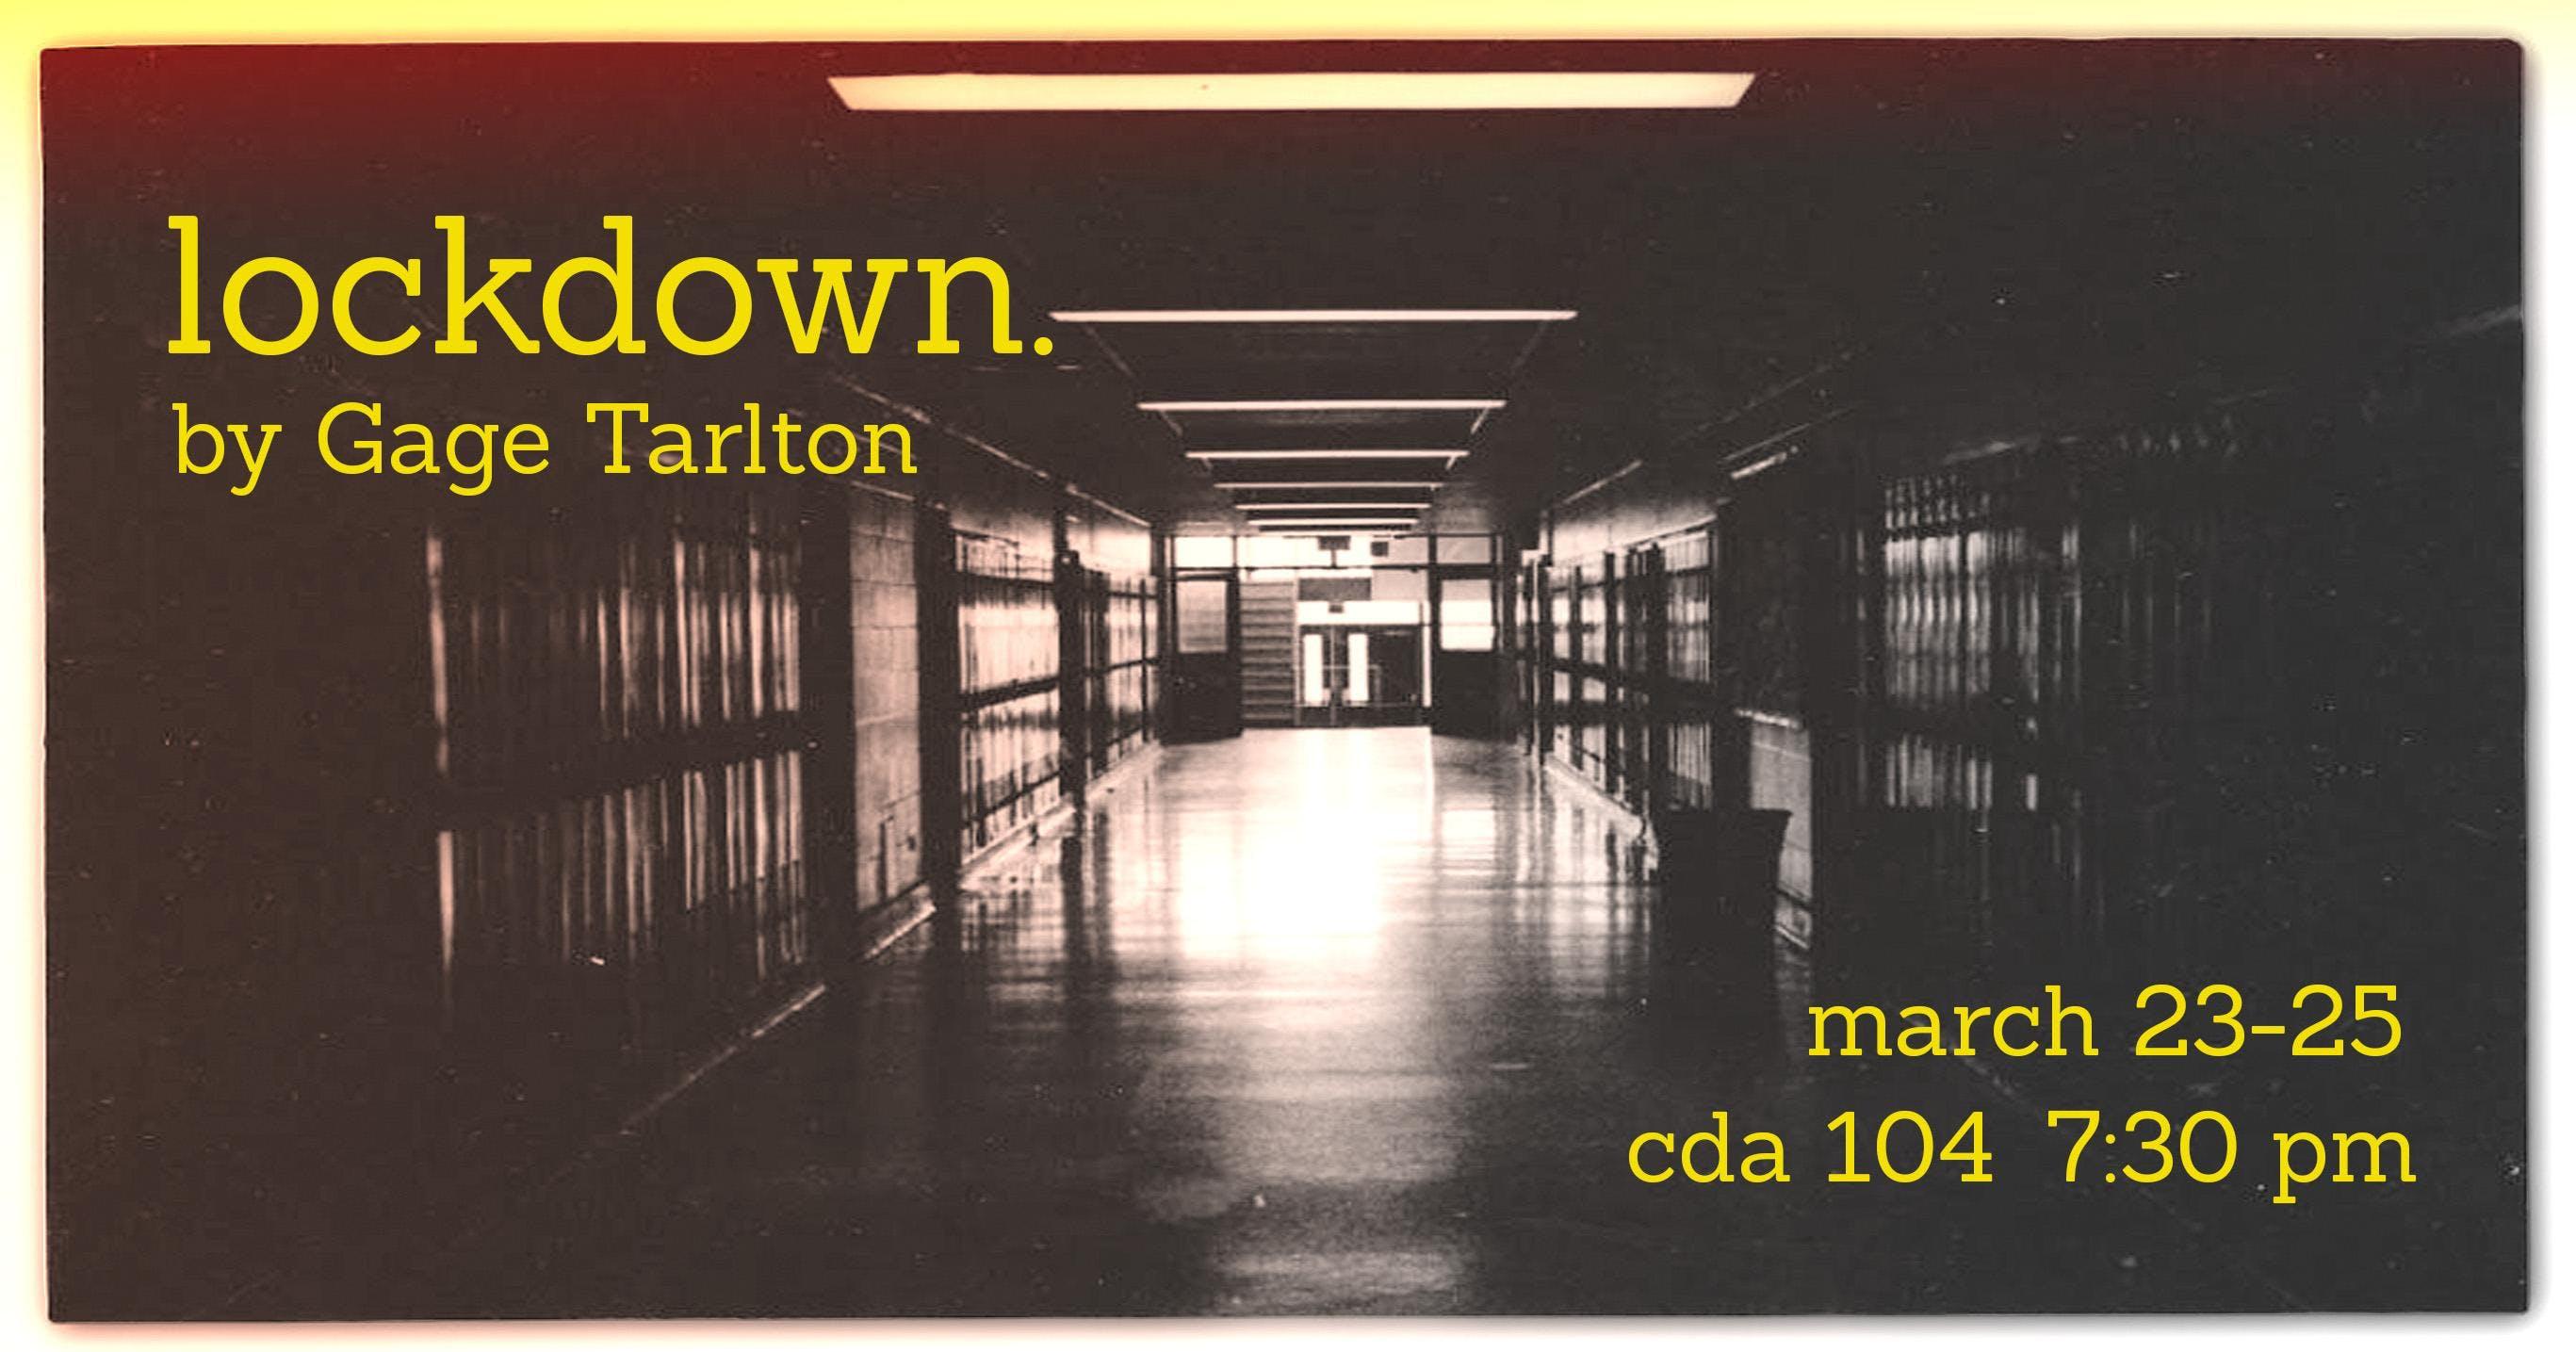 lockdown  (Saturday Night) - Orange Co  Arts Commission